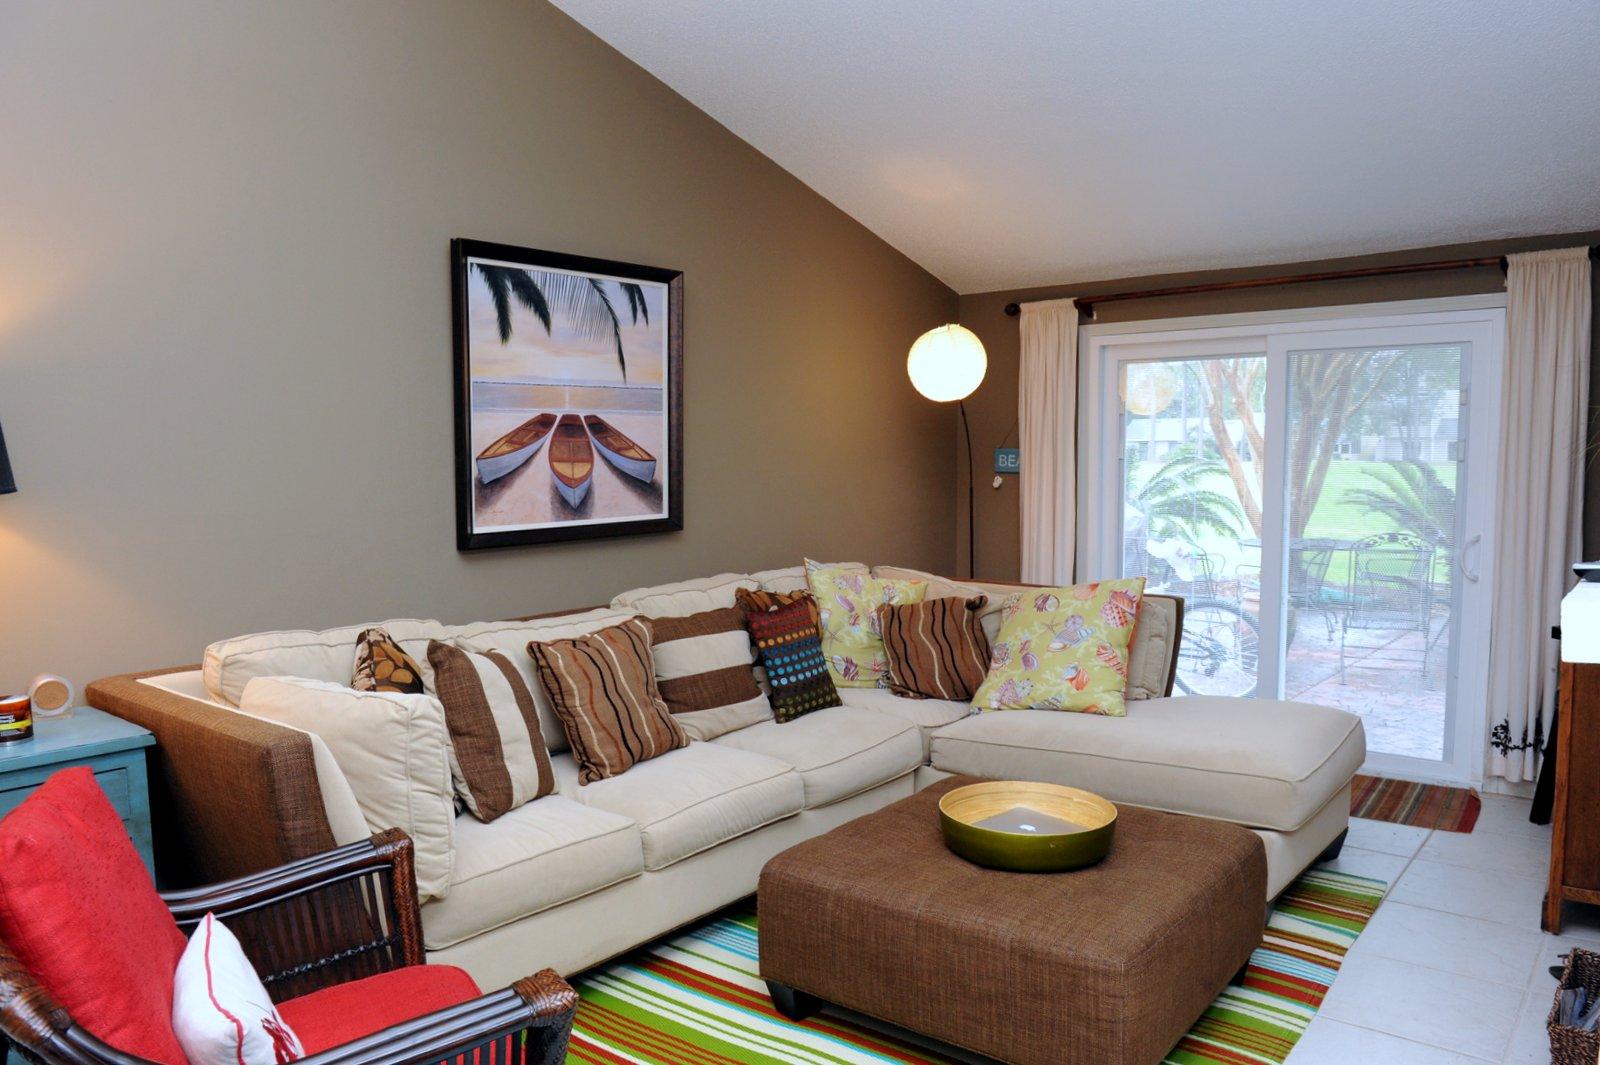 428 Linkside Condo rental in Sandestin Rentals ~ Cottages and Villas  in Destin Florida - #4